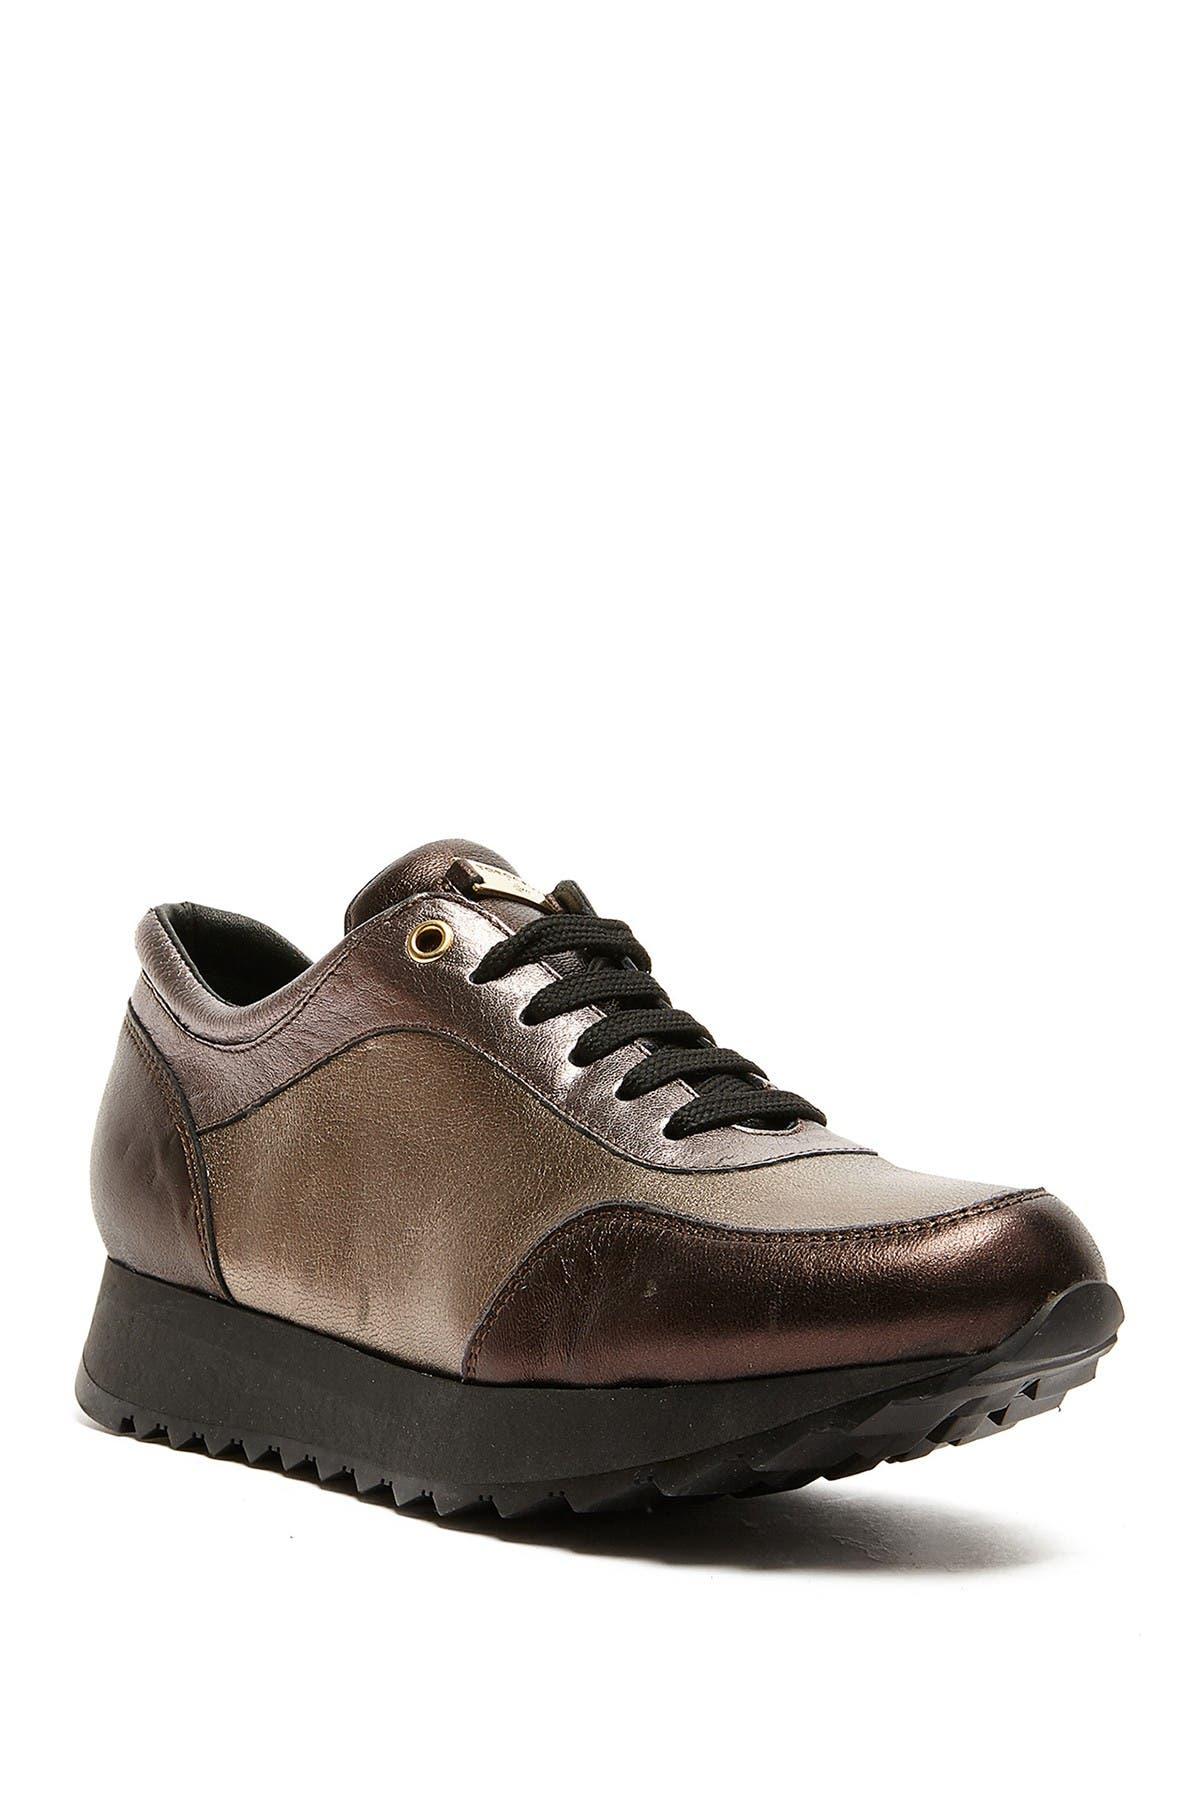 Image of TOSCA BLU Chamonix Lace-Up Sneaker